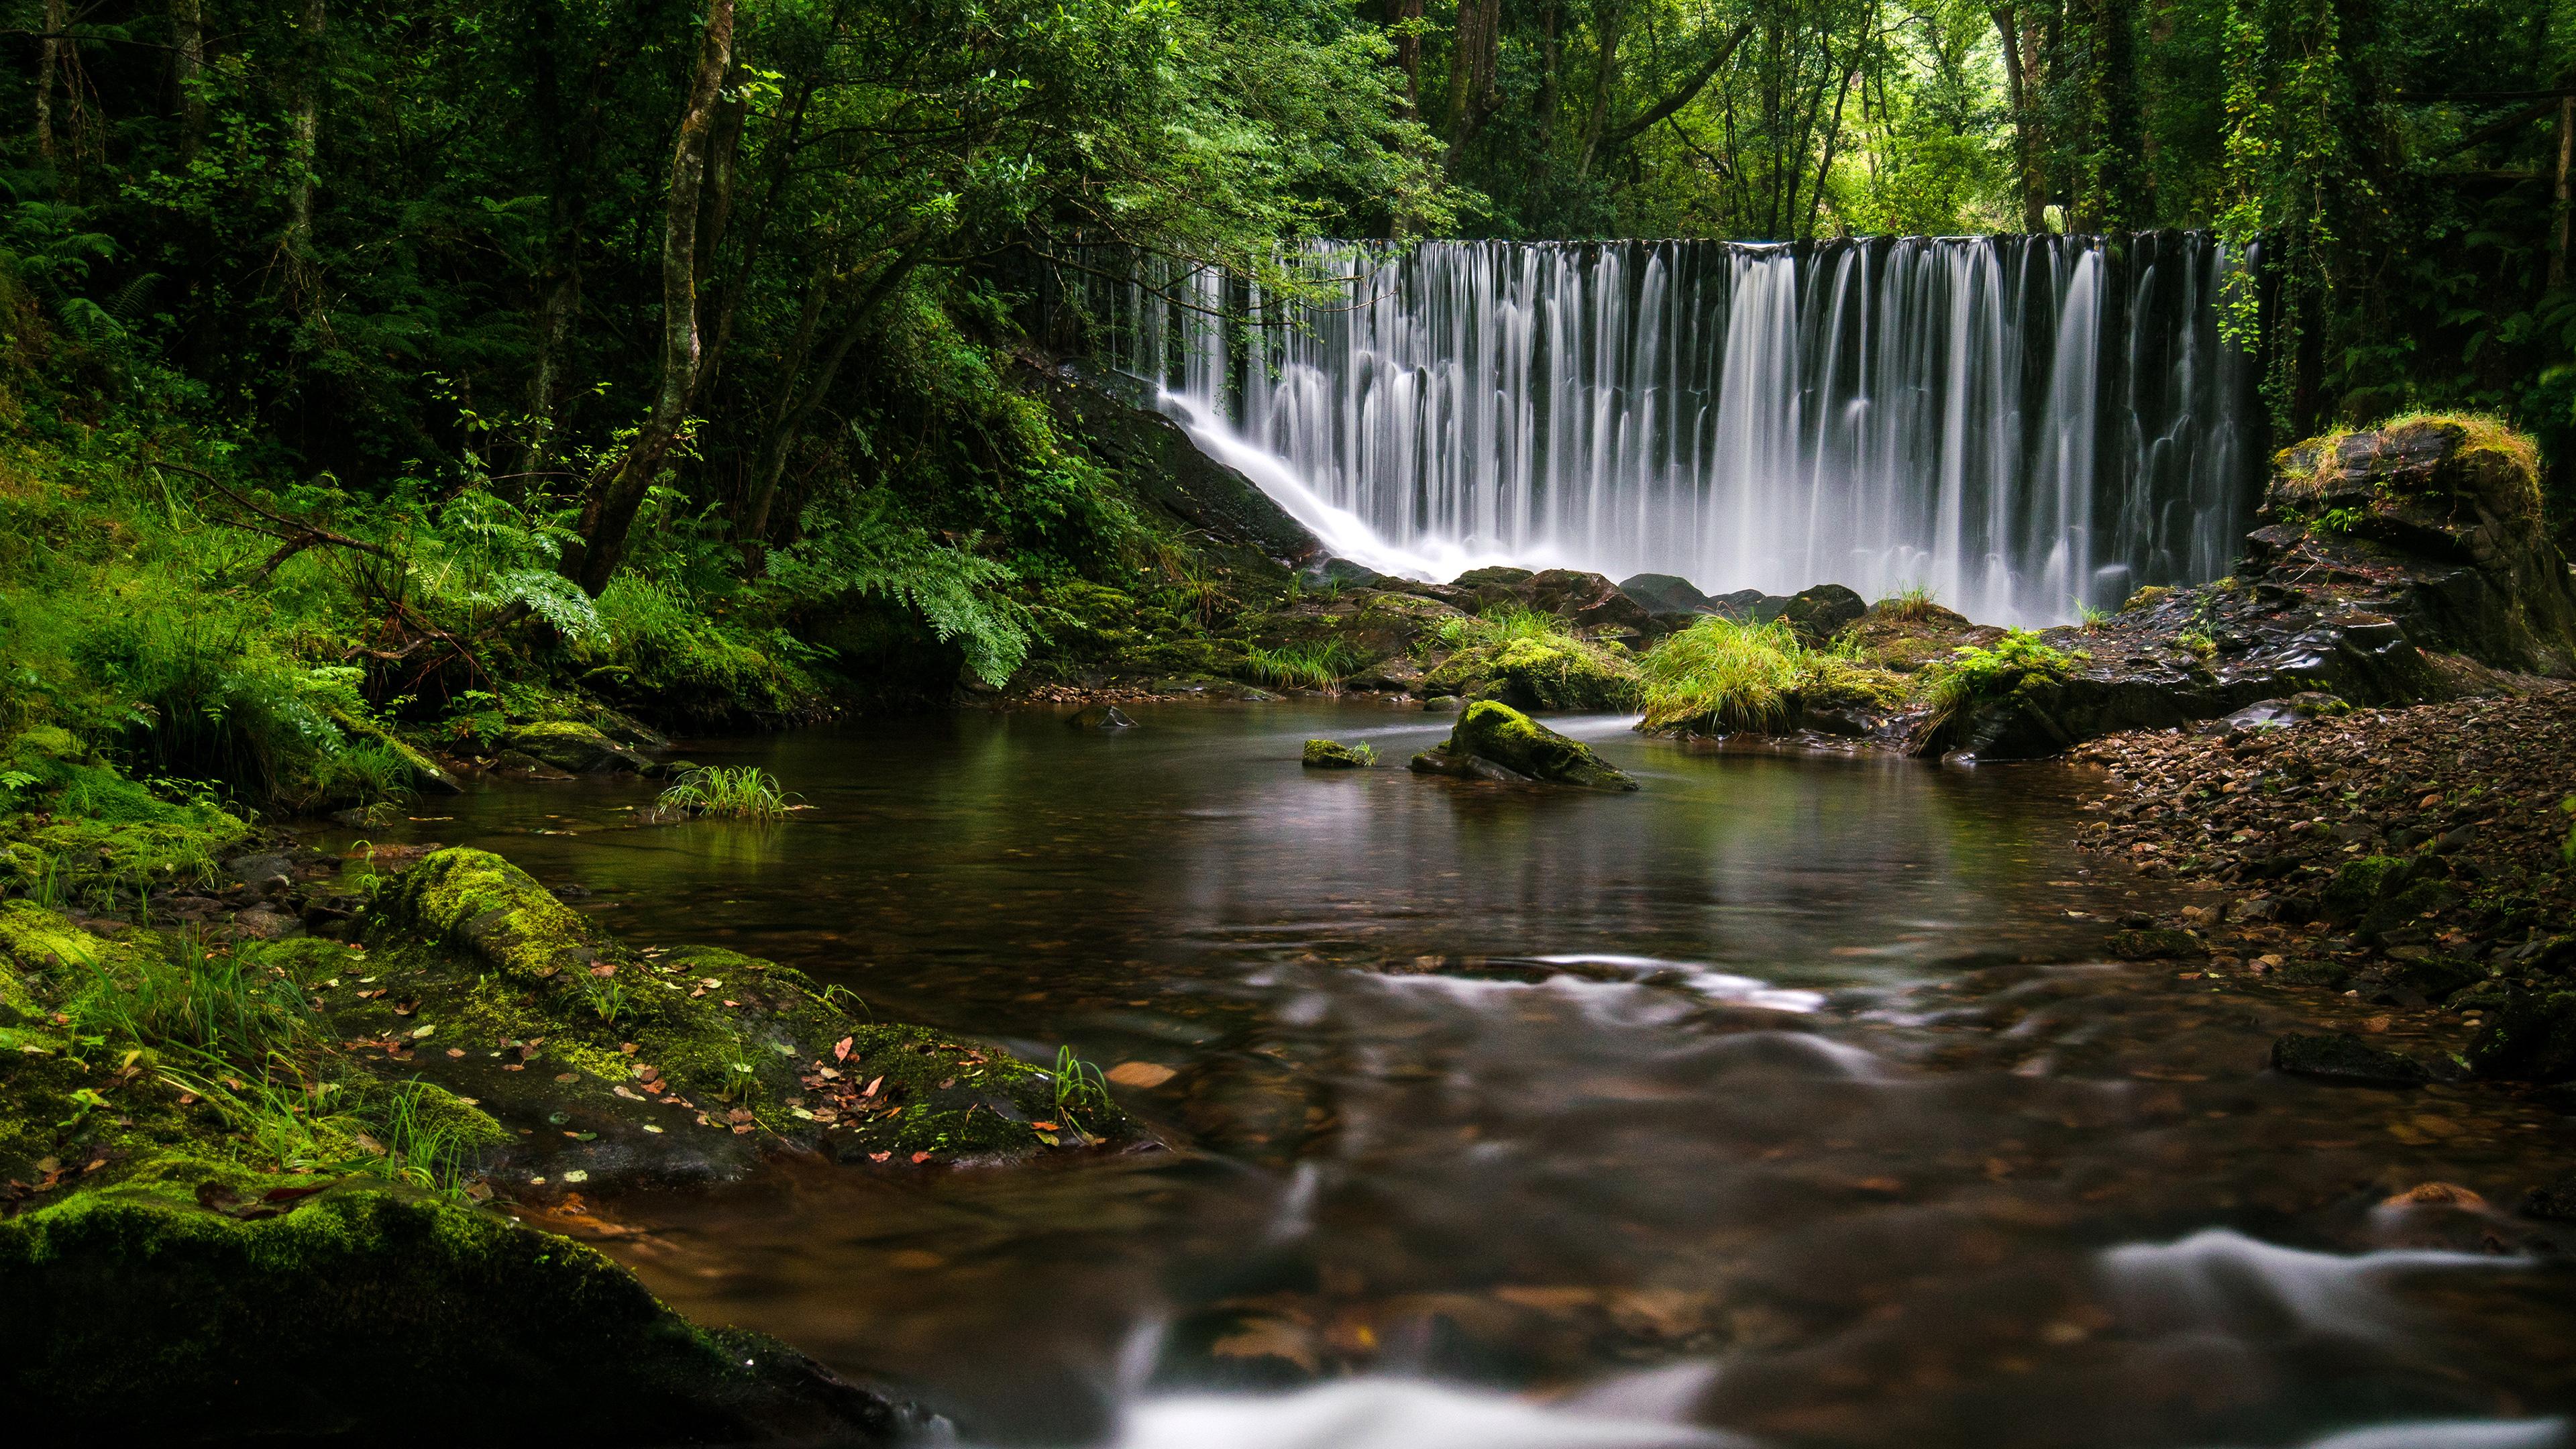 Galician waterfall 4k hd nature 4k wallpapers images - Wallpaper hd 4k ...